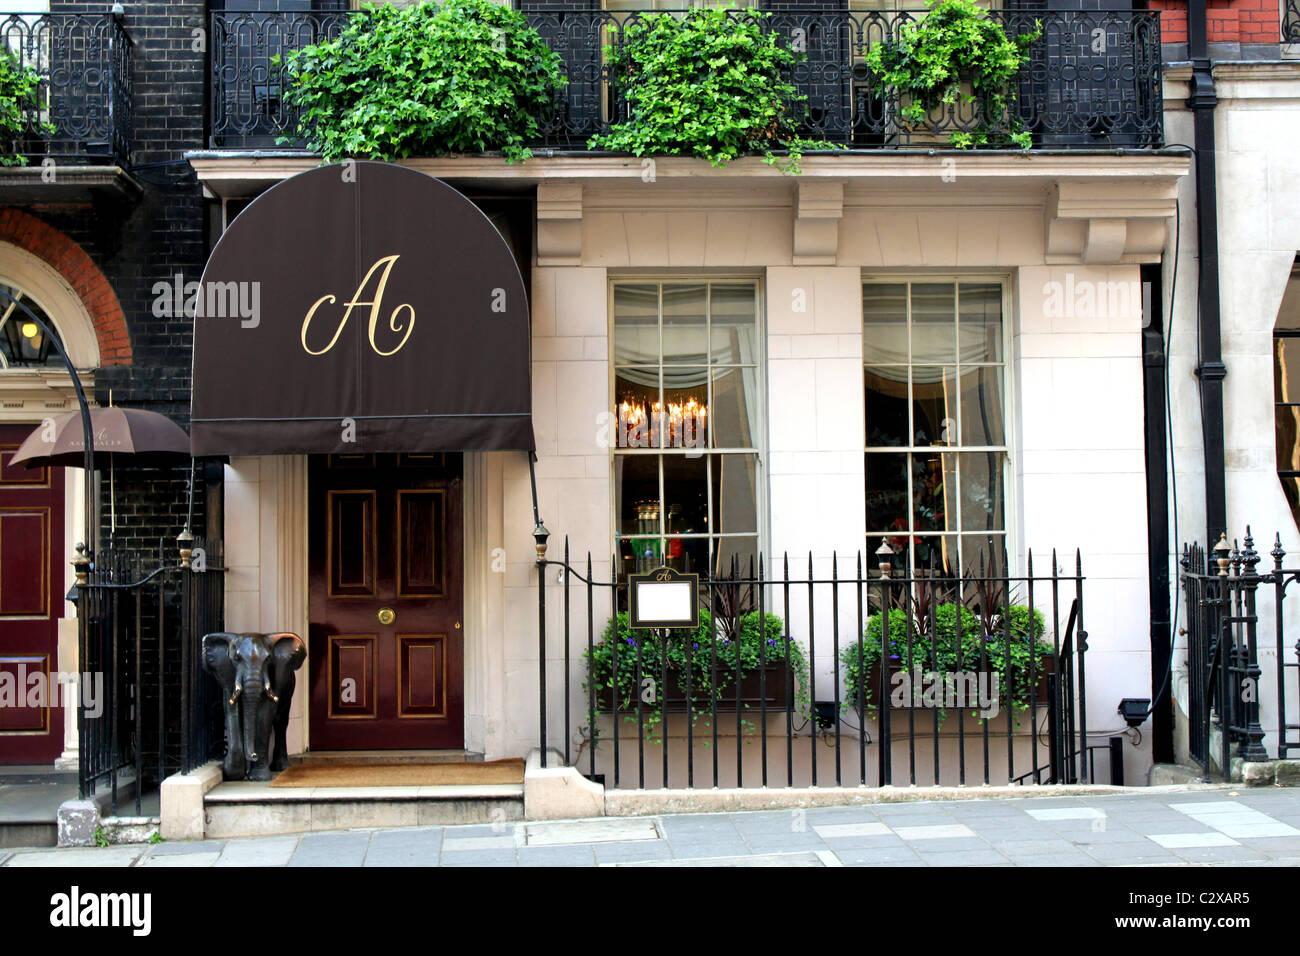 Facade of Aspinalls Gaming Club, Curzon Street, W1, Mayfair, London - Stock Image